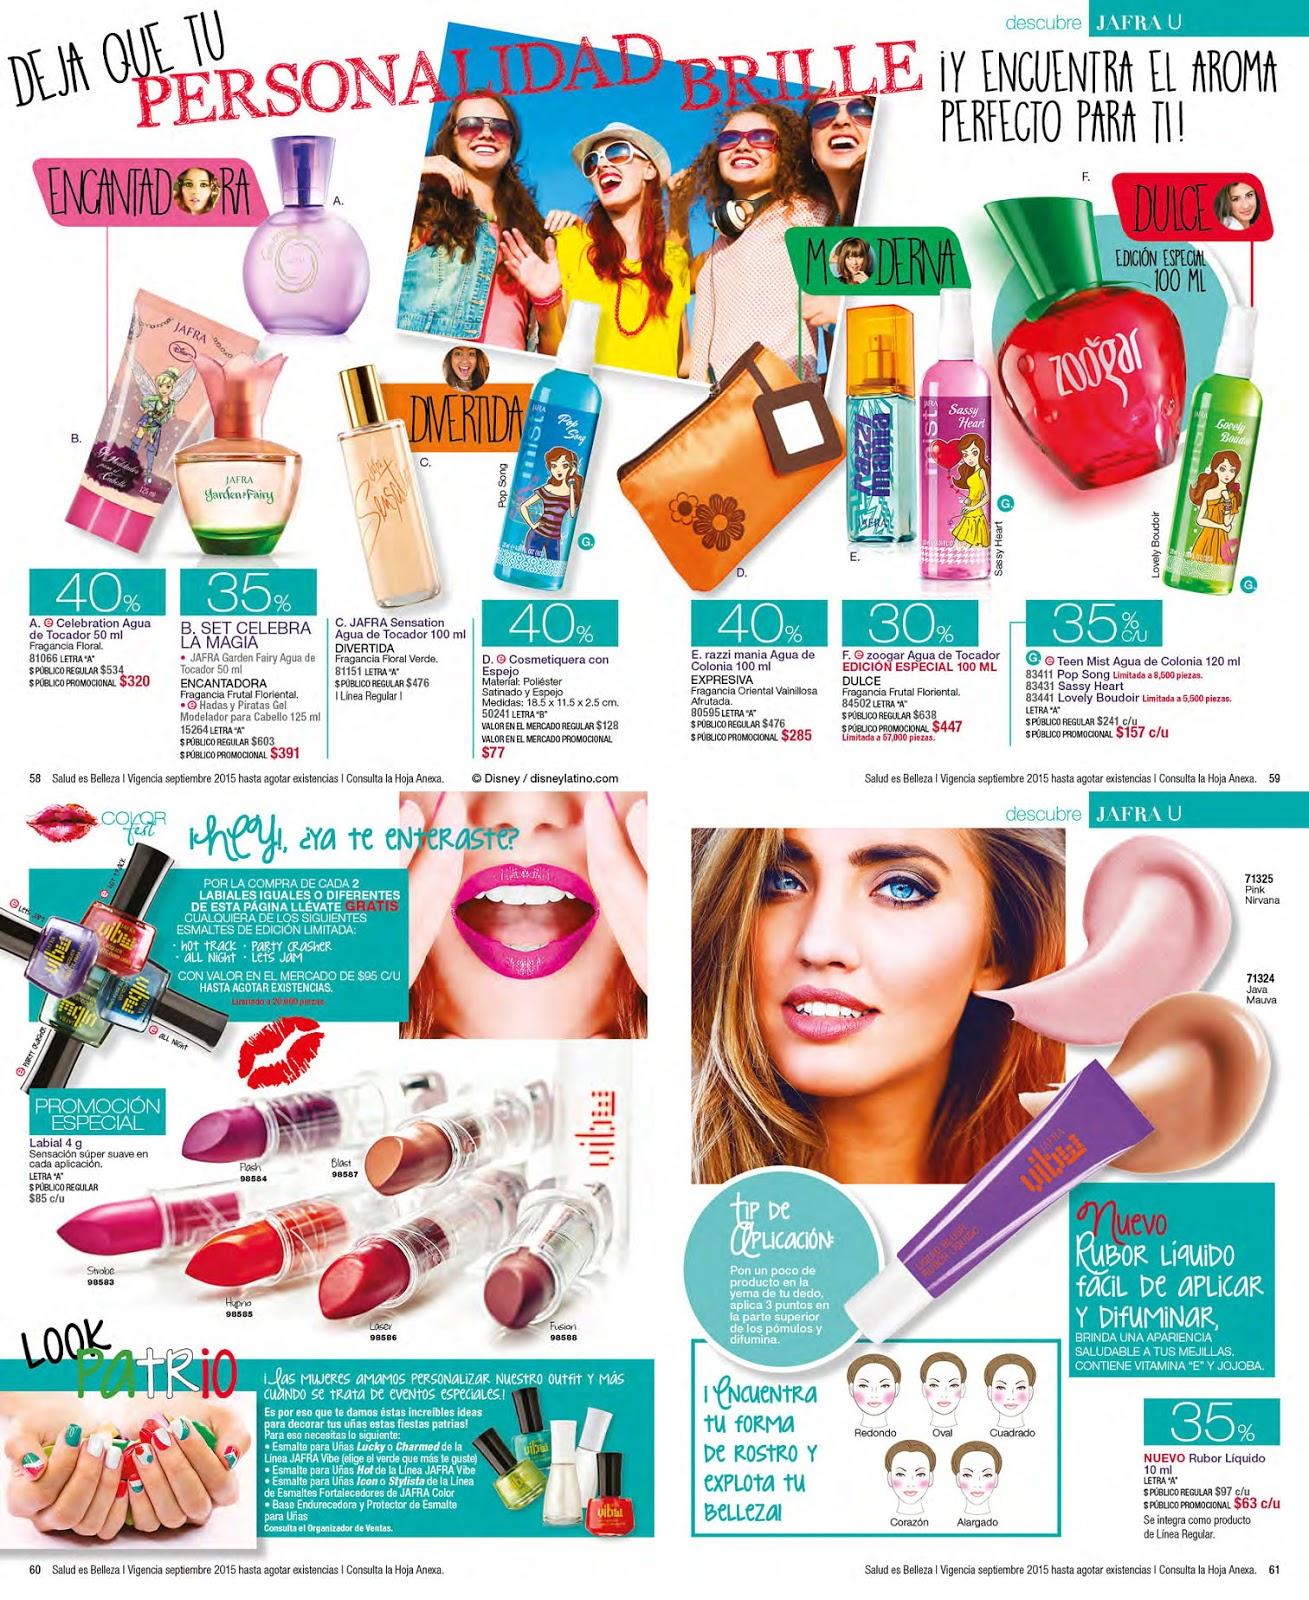 Linaje jafravic catalogo jafra septiembre 2015 for Catalogo puntos bp